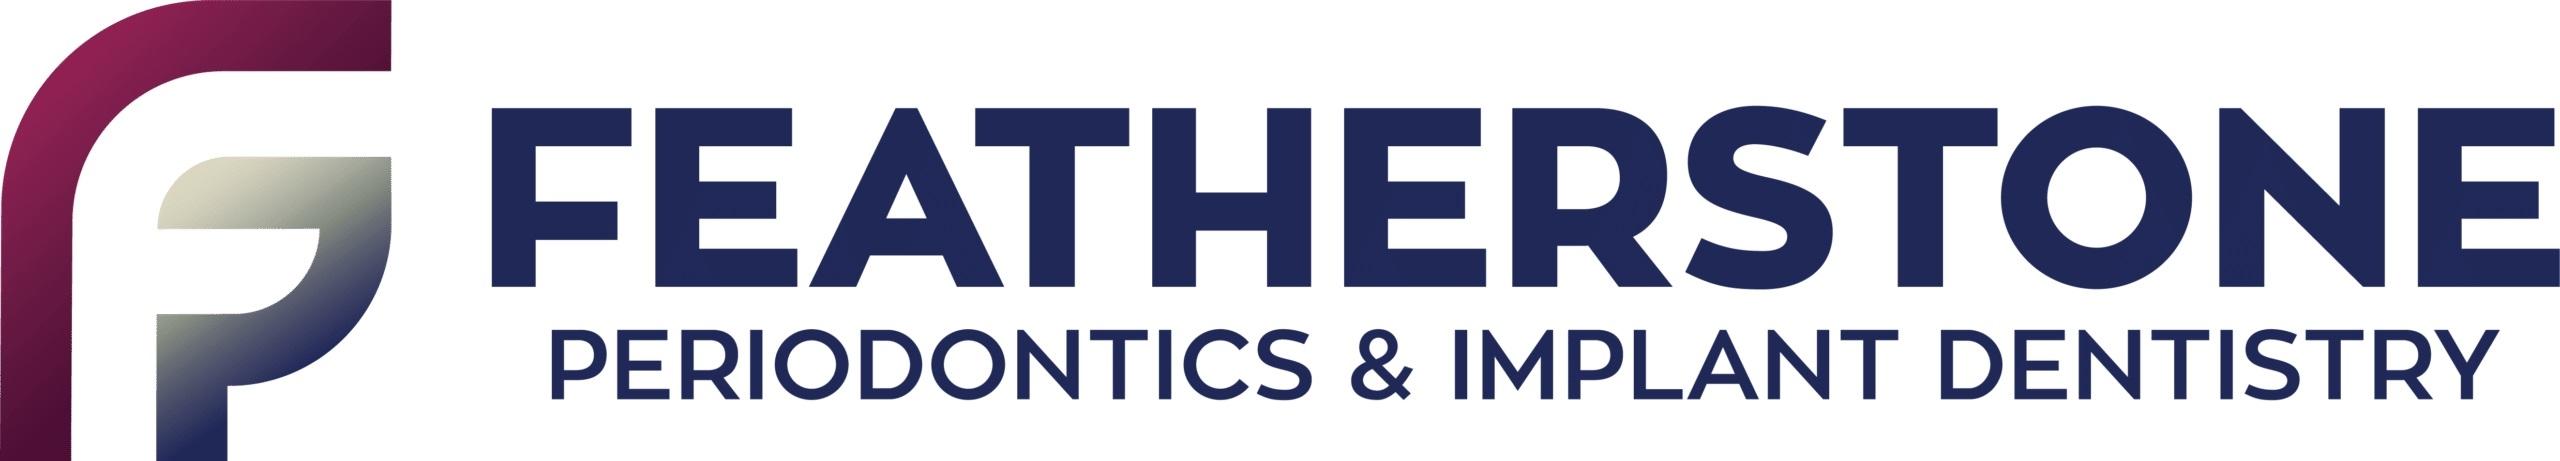 Featherstone Periodontics & Implant Dentistry - Ro (@featherstoneperio) Cover Image